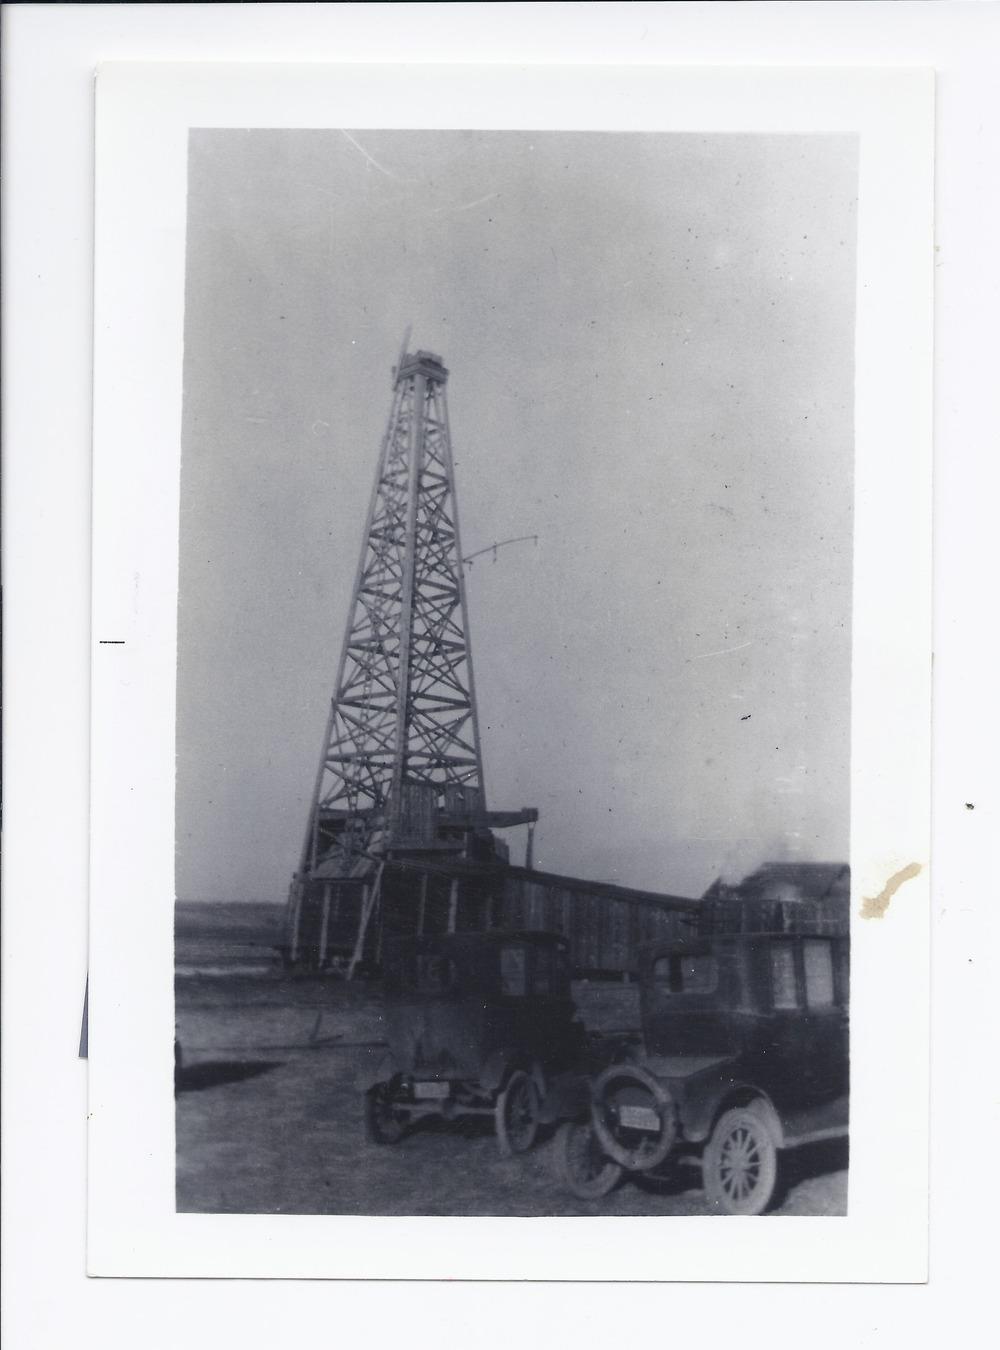 Oil well, Rossville, Kansas